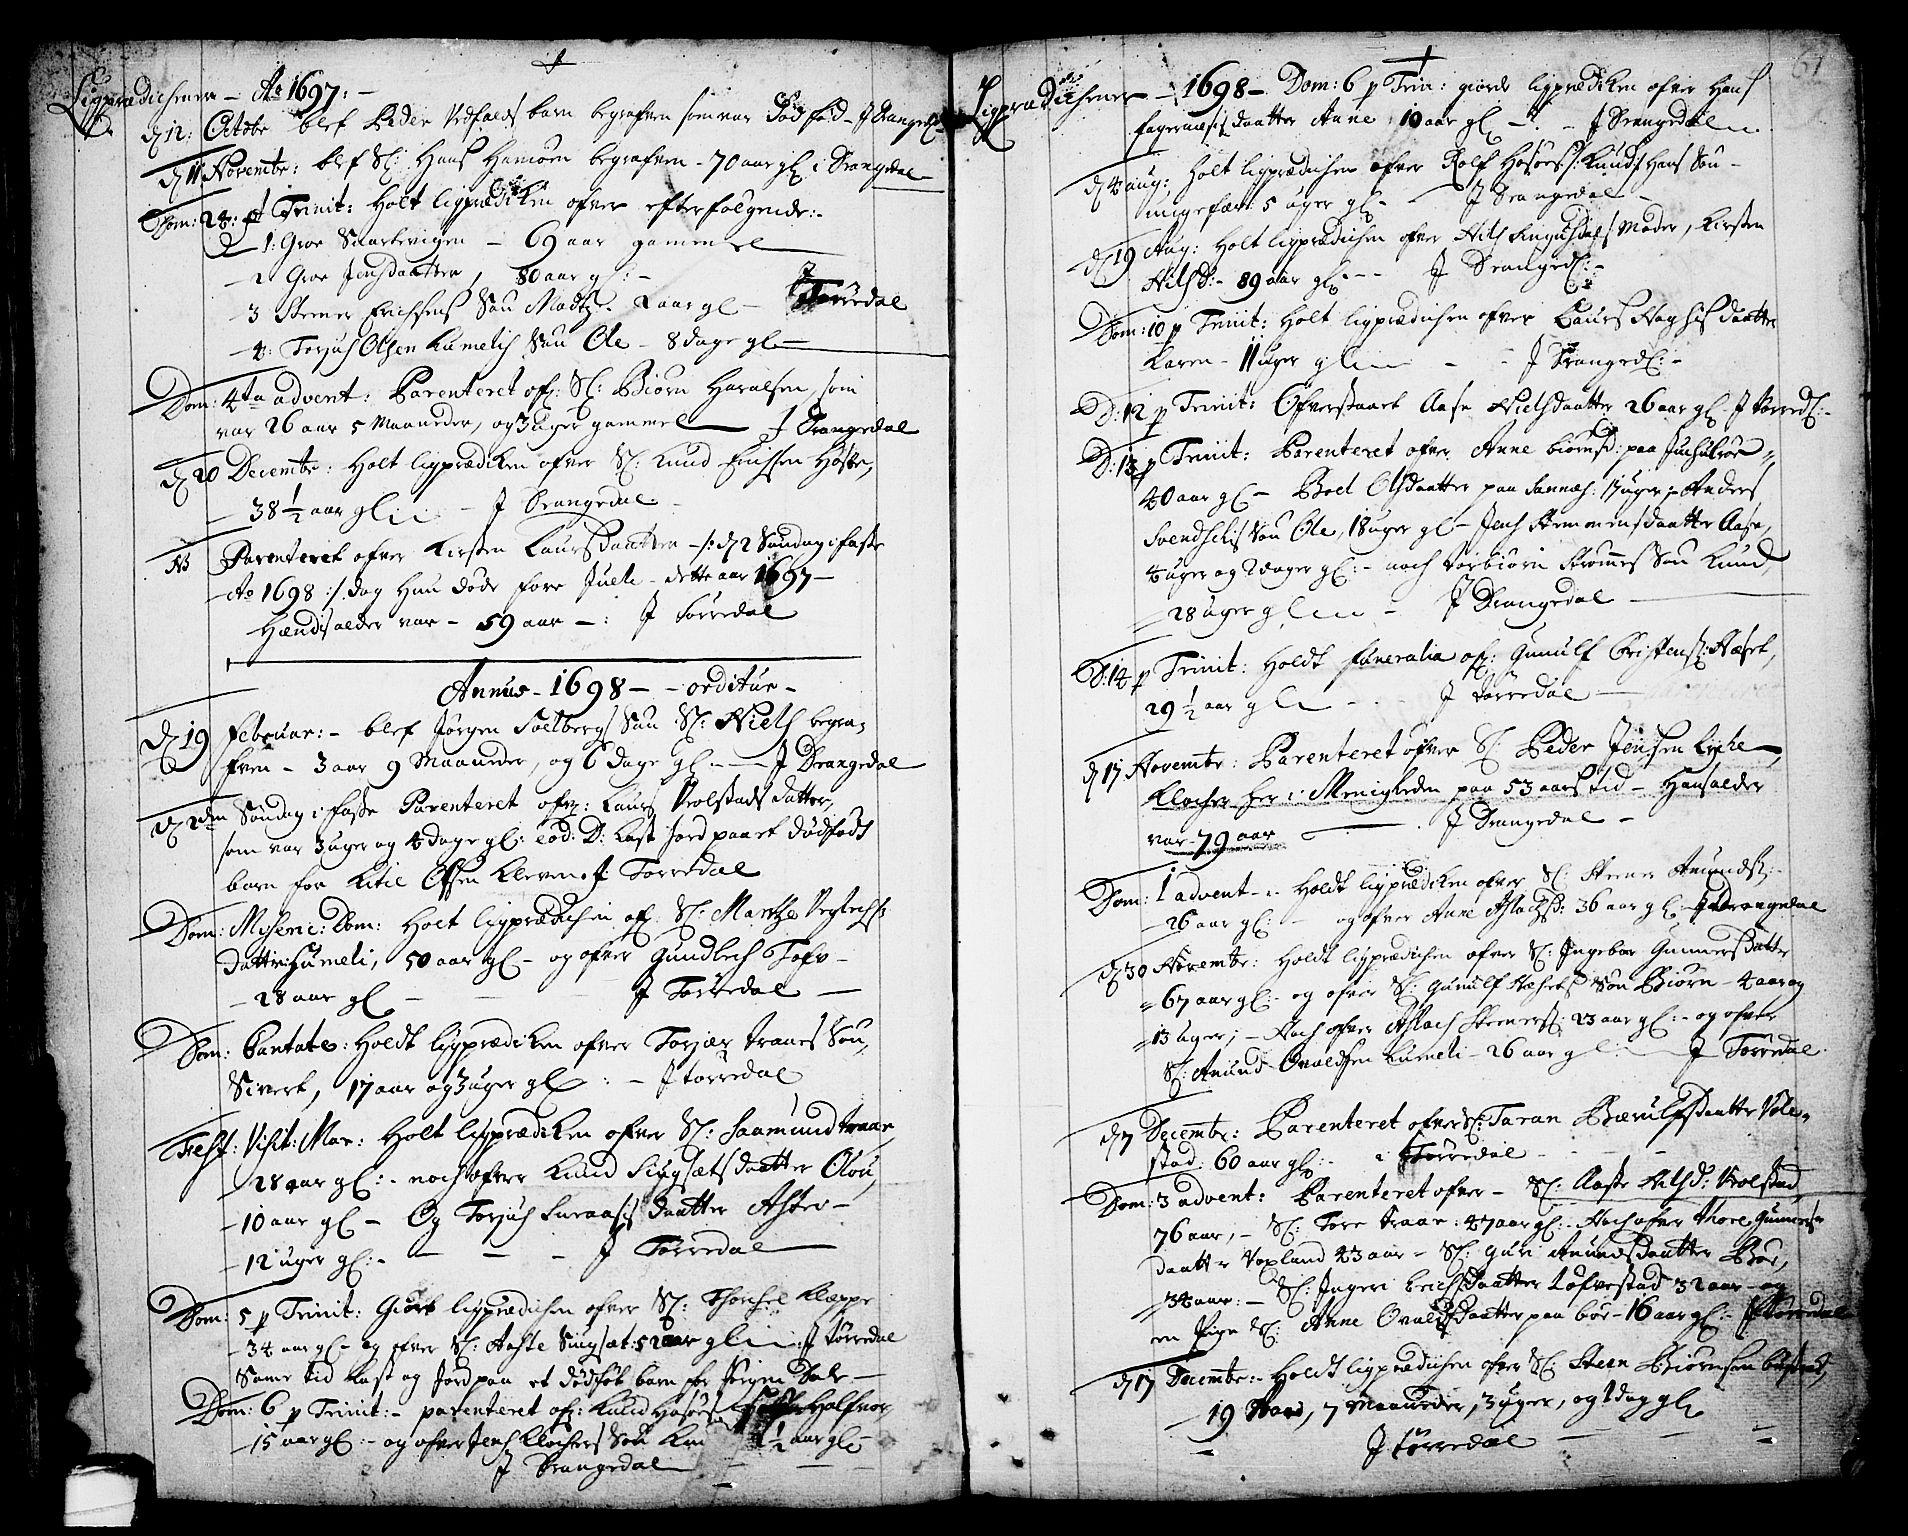 SAKO, Drangedal kirkebøker, F/Fa/L0001: Ministerialbok nr. 1, 1697-1767, s. 61